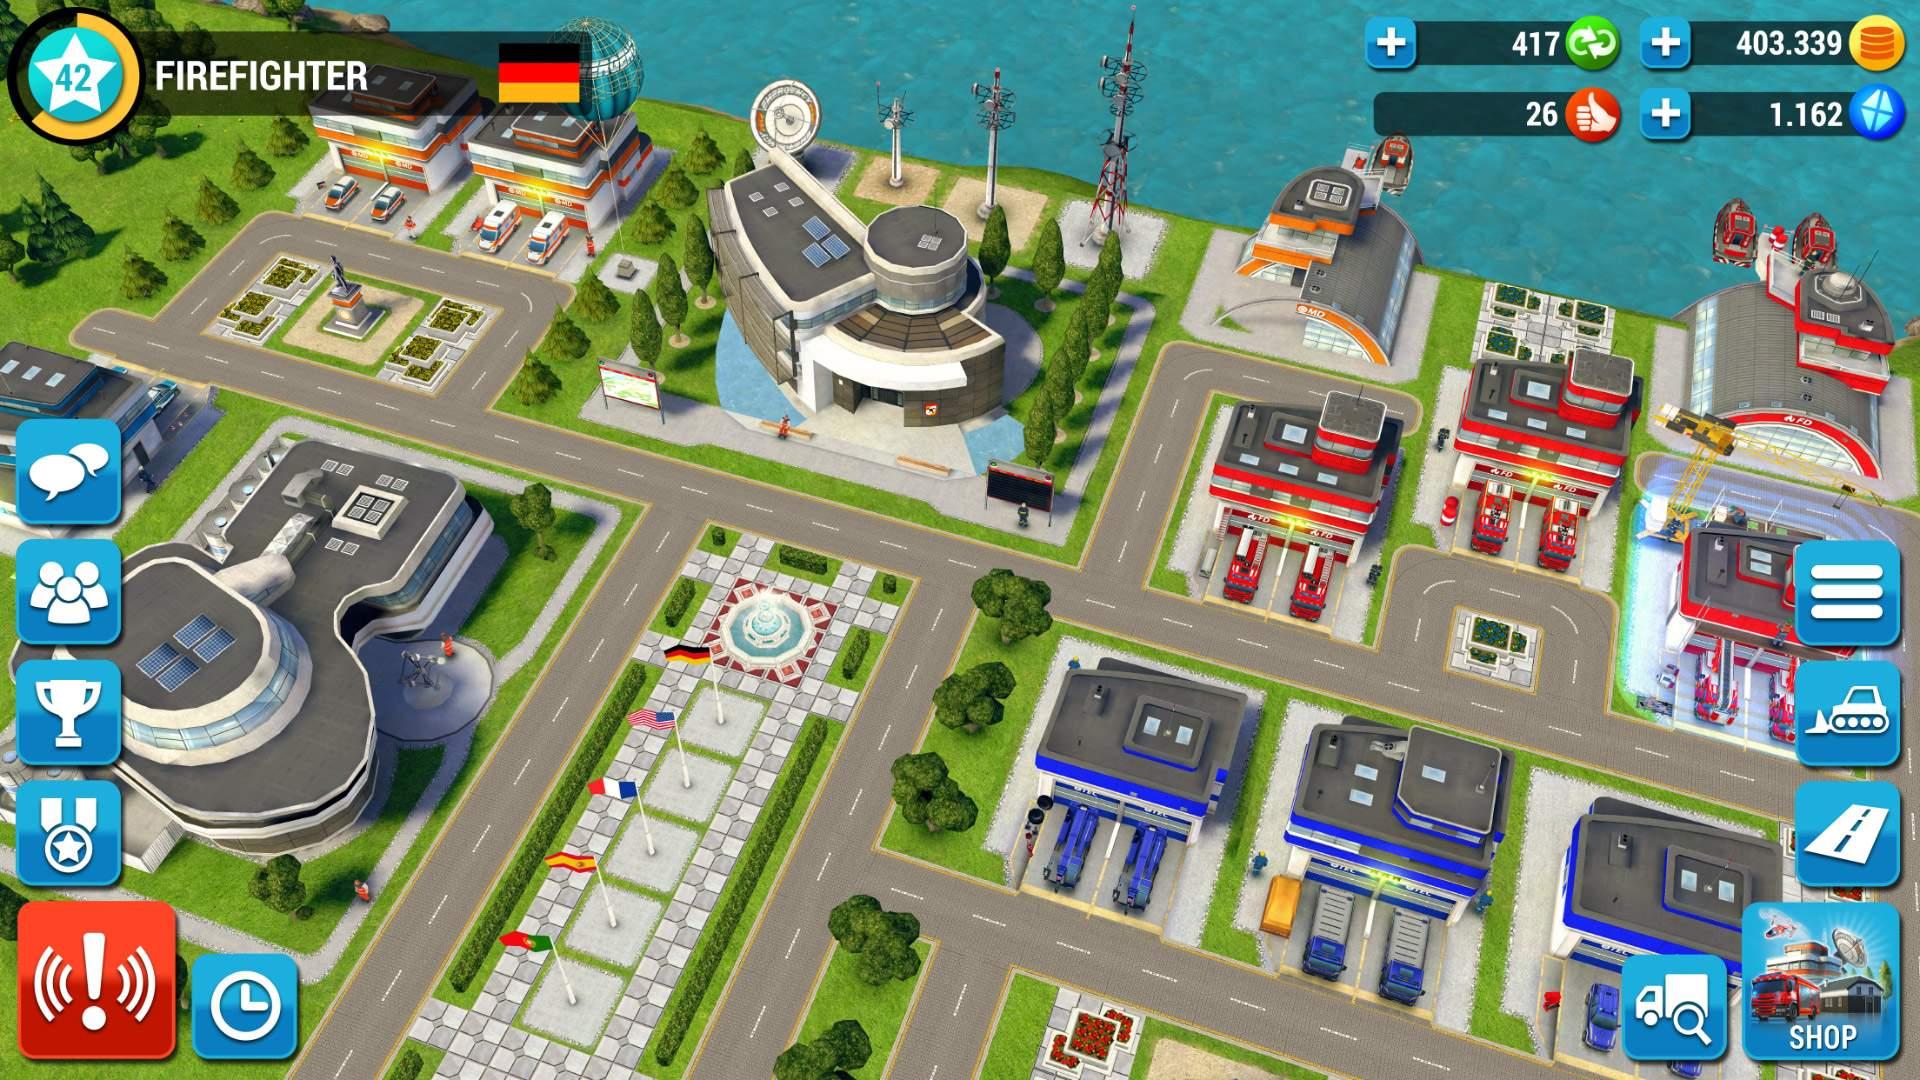 GAMES | Sixteen Tons Entertainment GmbH